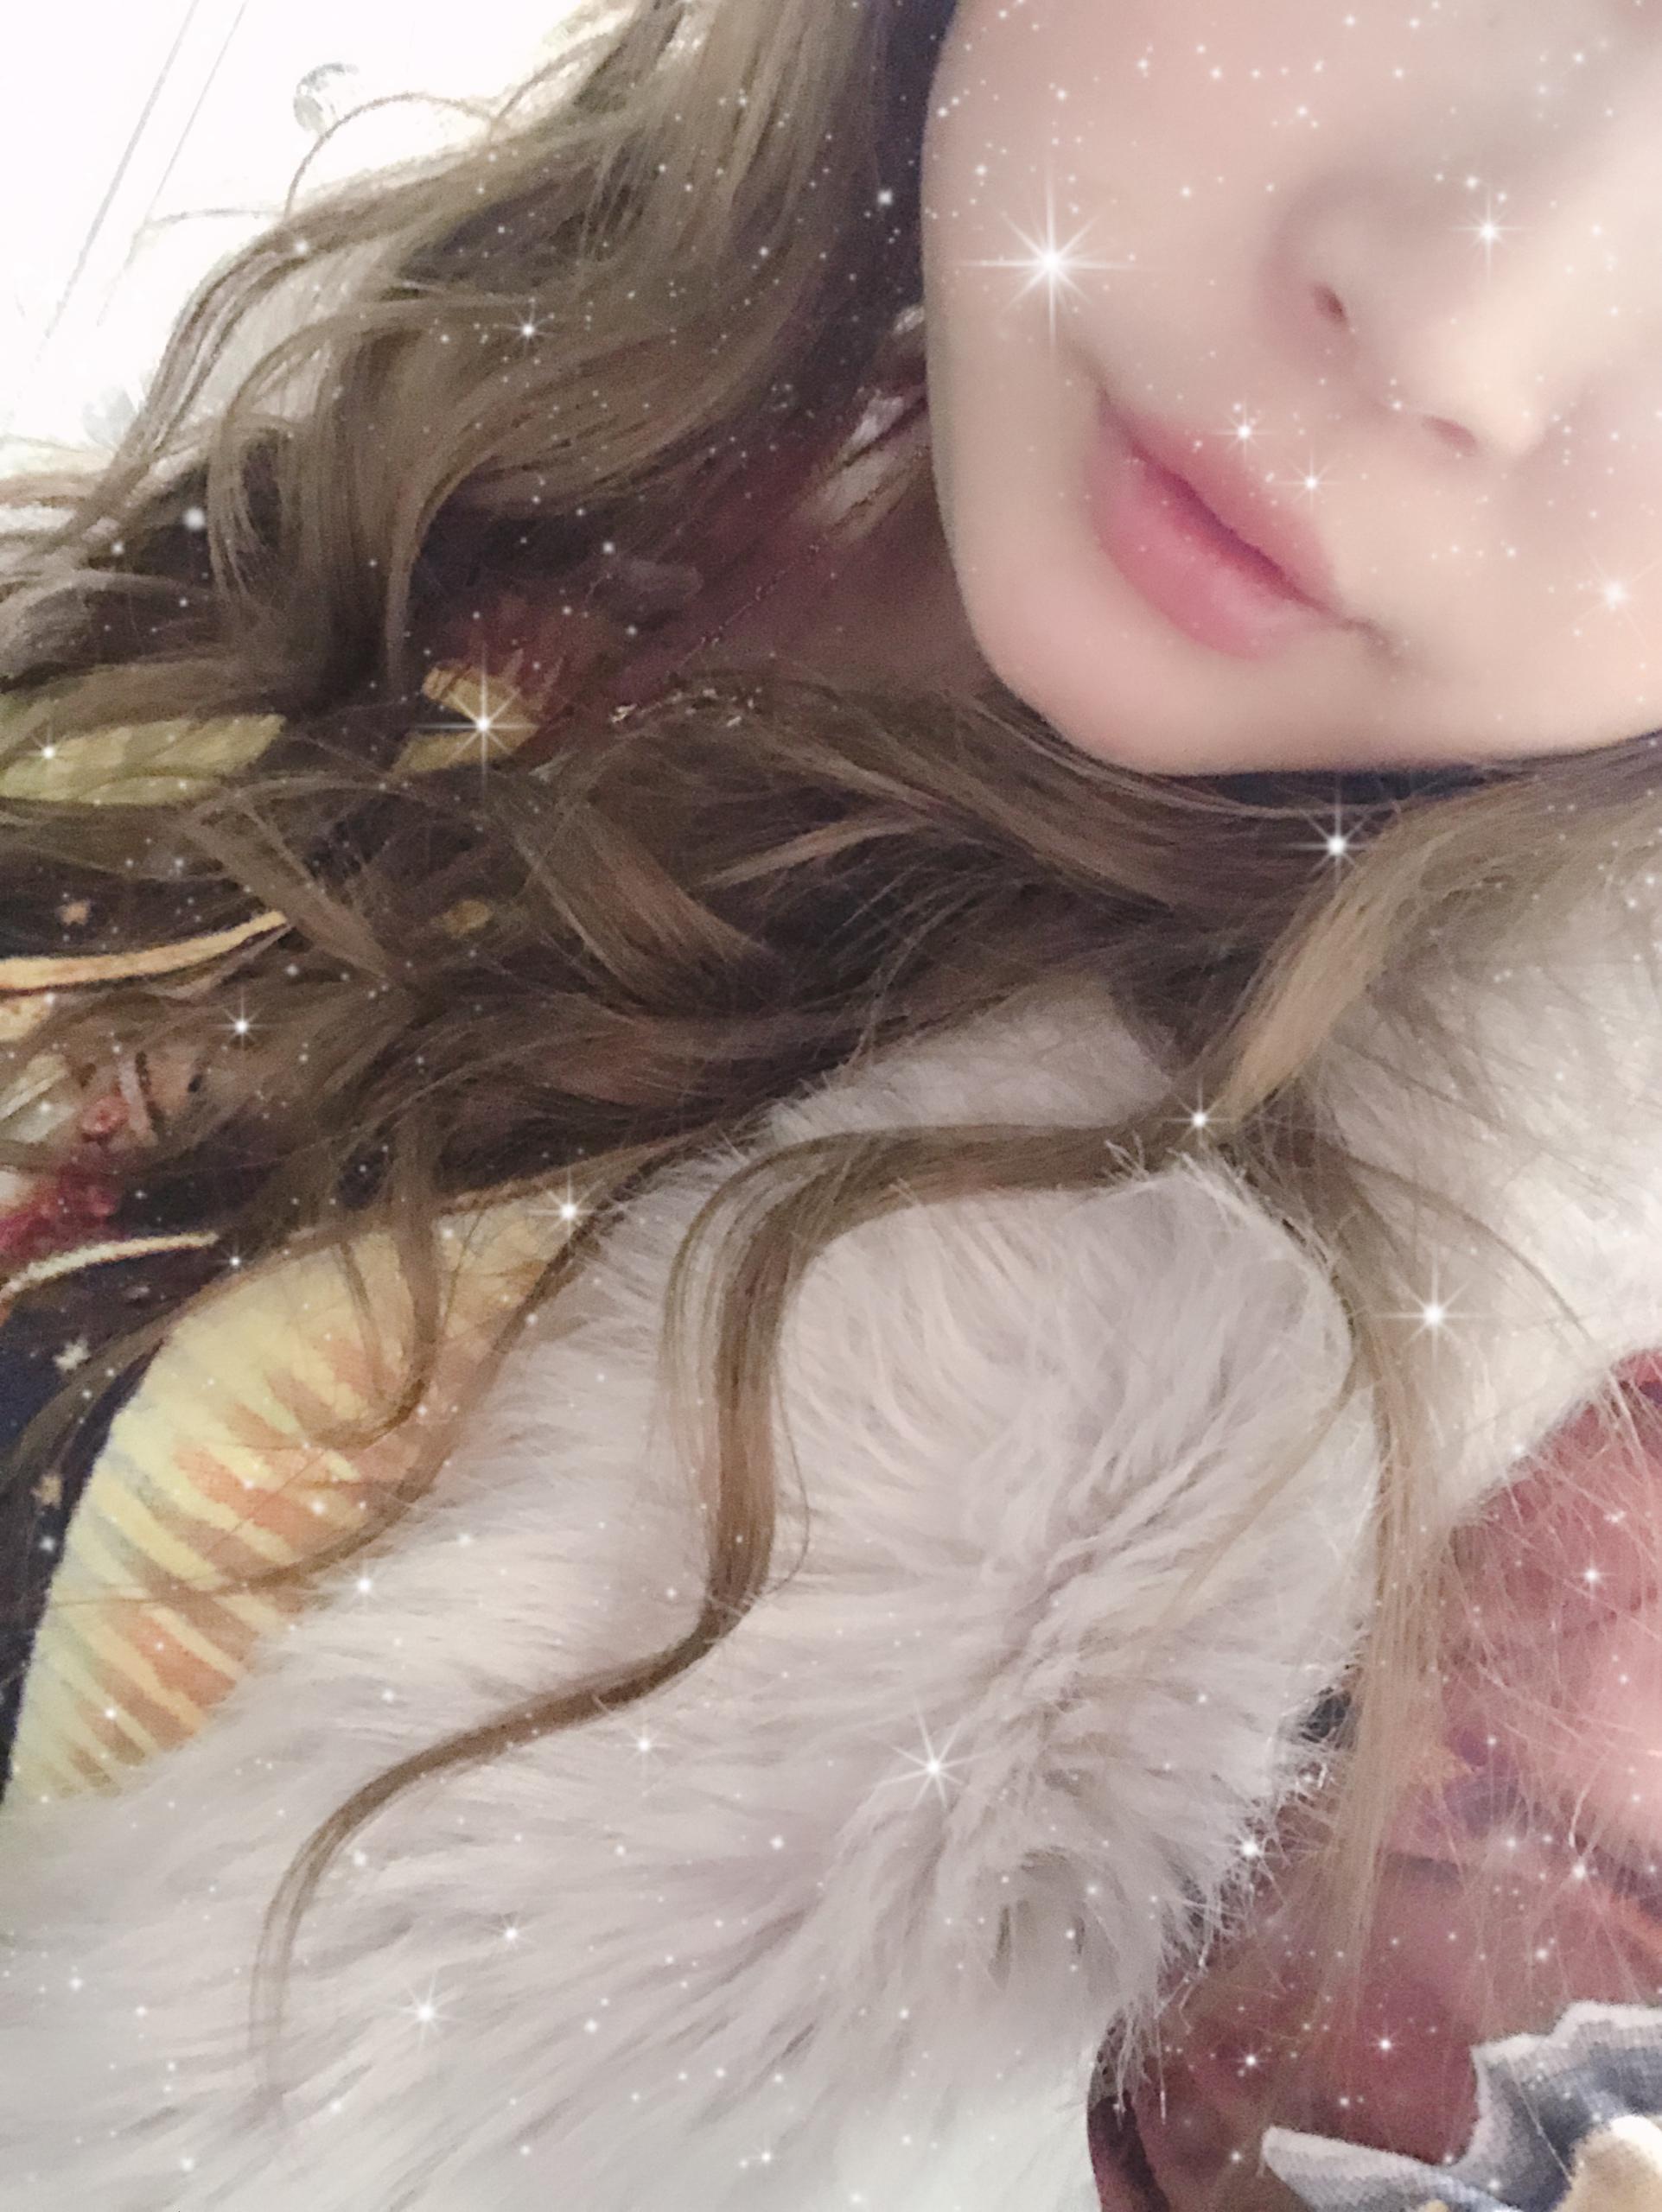 「♡˖꒰ᵕ༚ᵕ⑅꒱」12/14(12/14) 18:18 | きらりの写メ・風俗動画